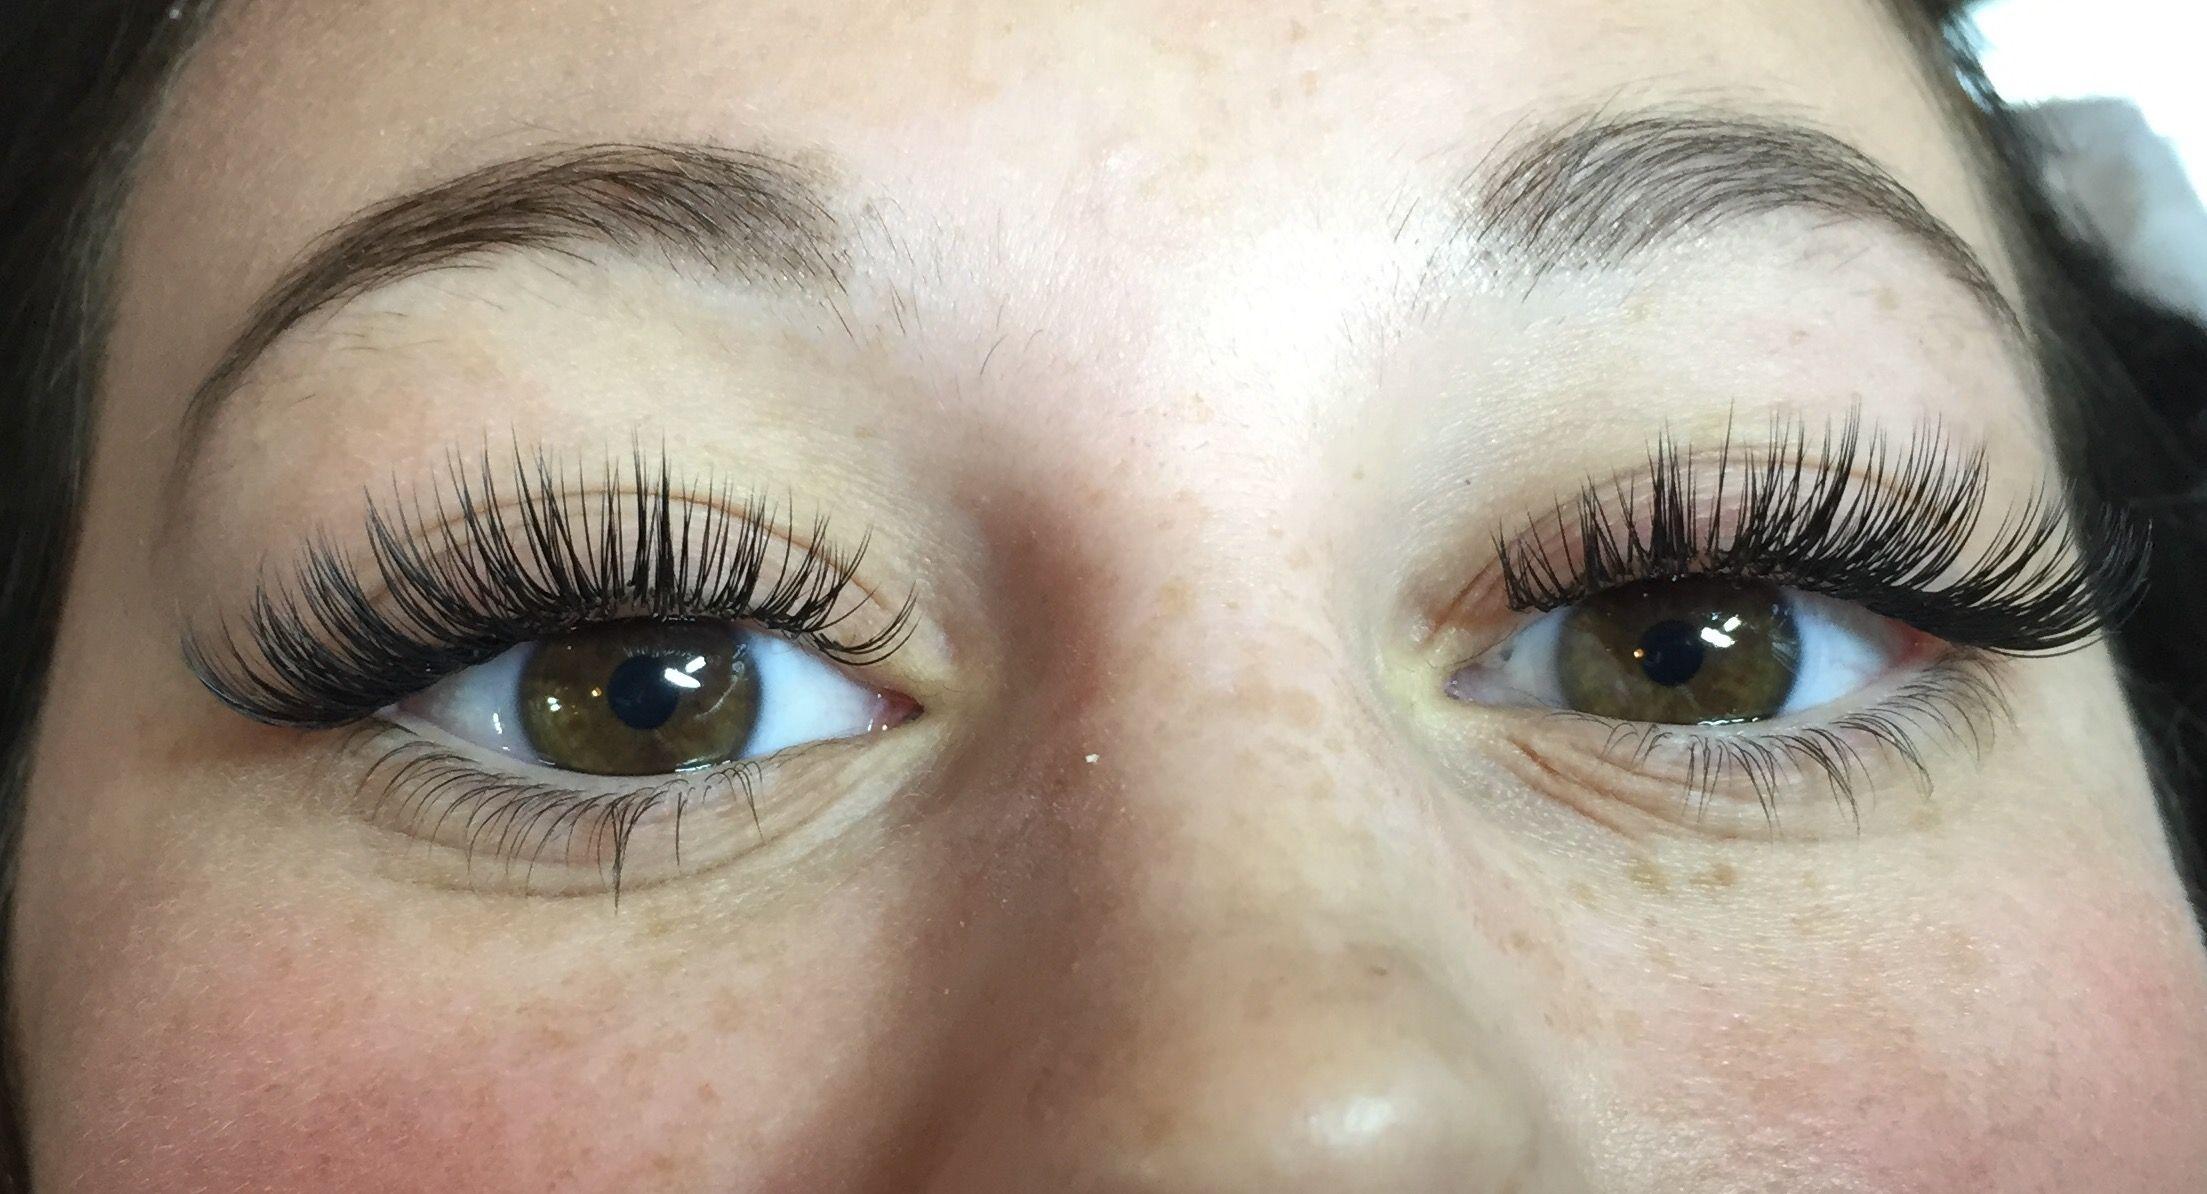 PinterestMELANIN PRINCESS Curling eyelashes, Eyelash